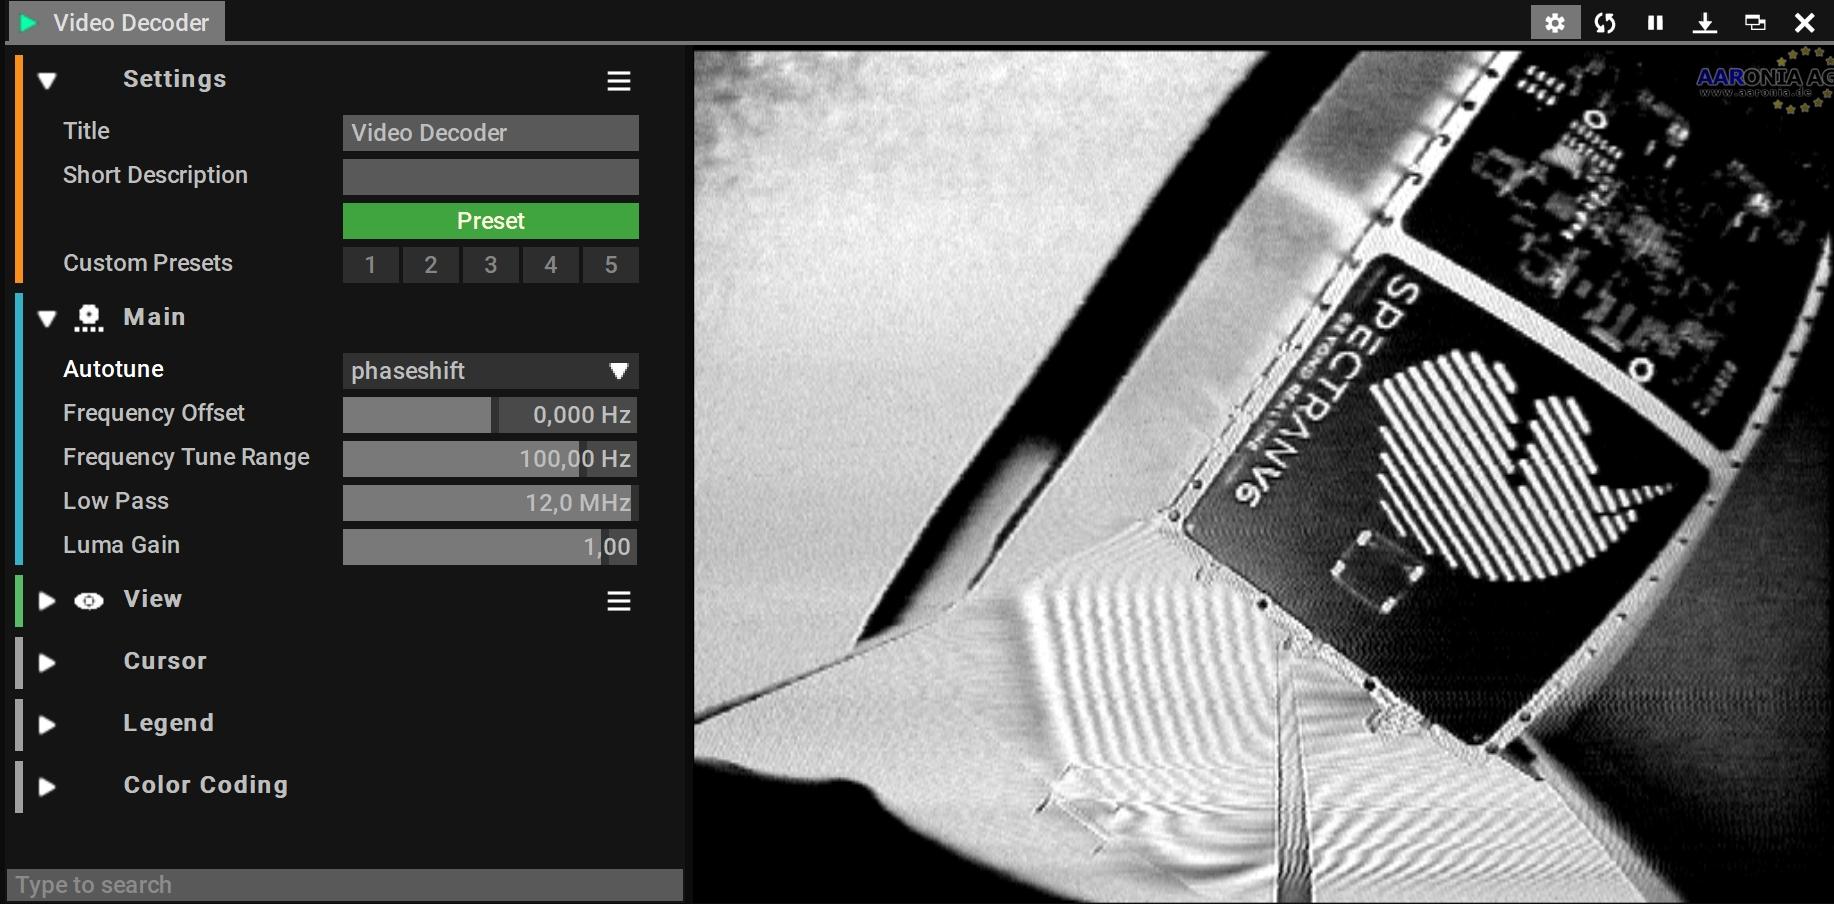 Automatic Analog Video Decoding